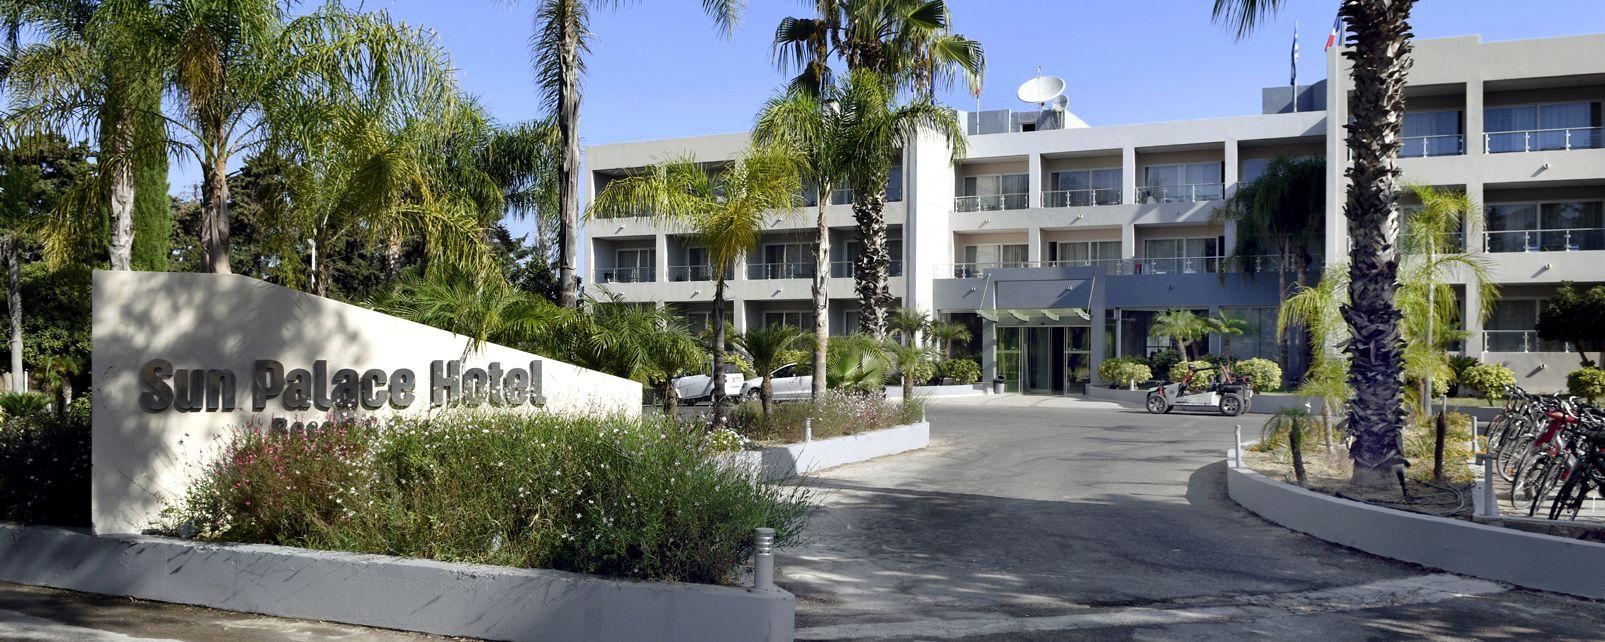 Club Lookéa Sun Palace